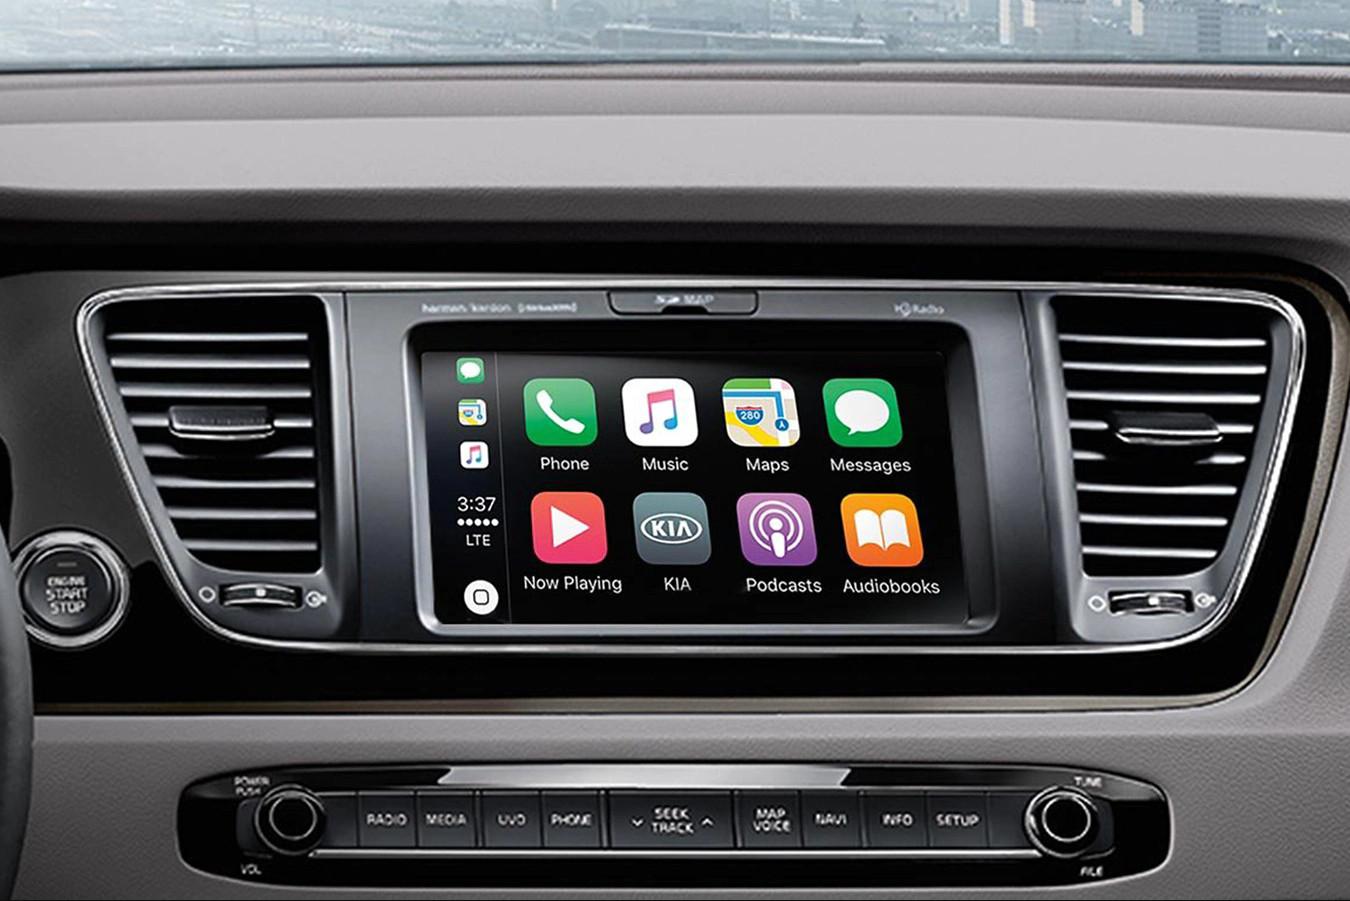 2020 Sedona Touchscreen